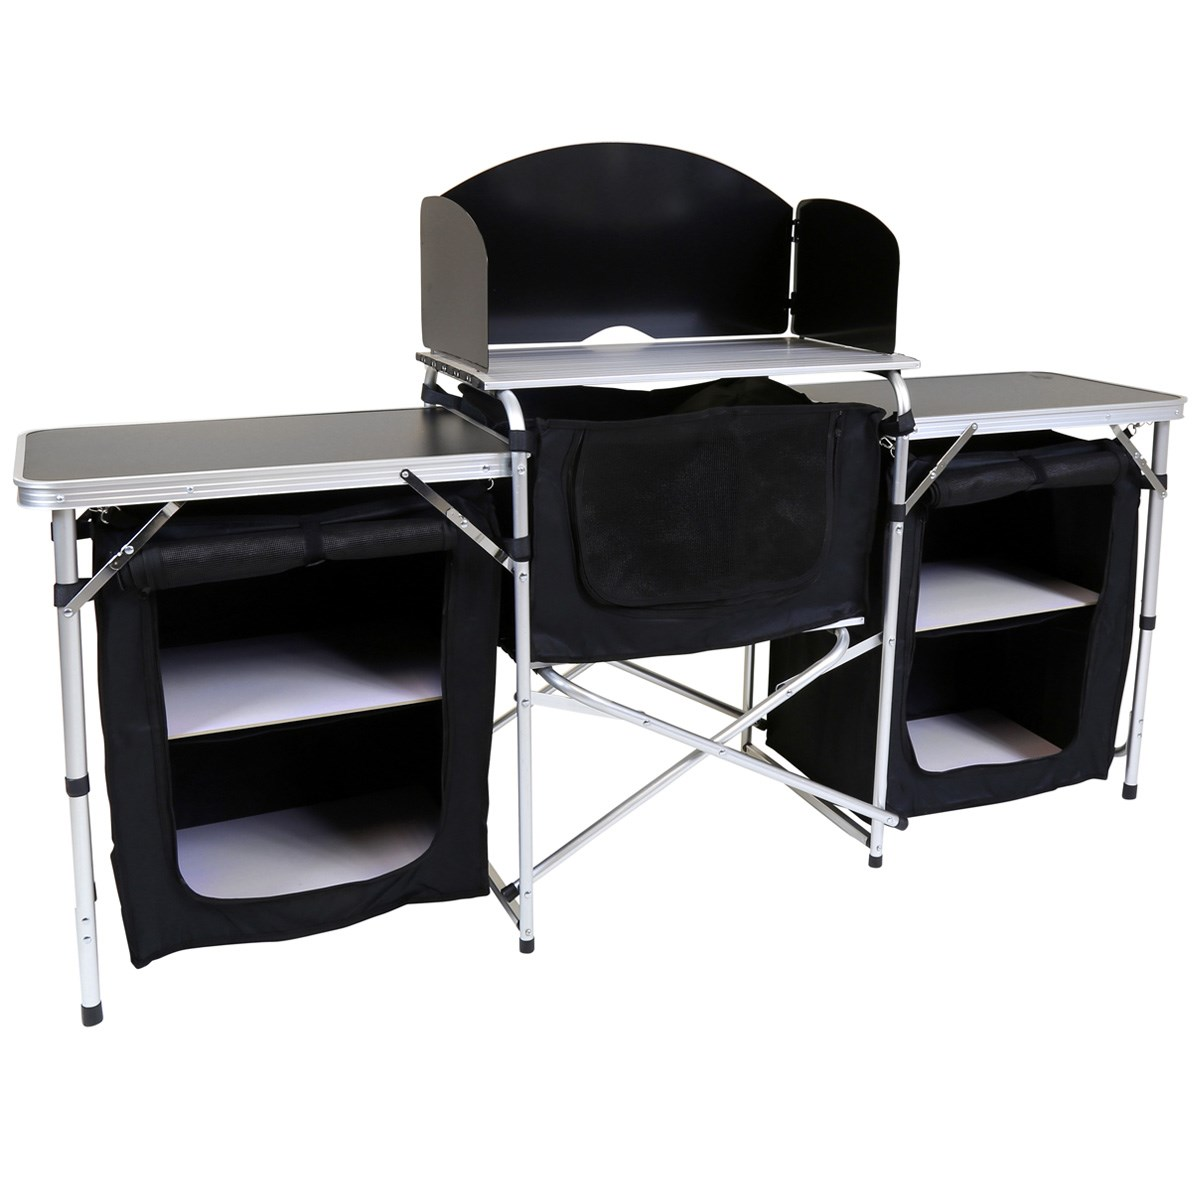 Large Folding Kitchen Camping Storage Unit